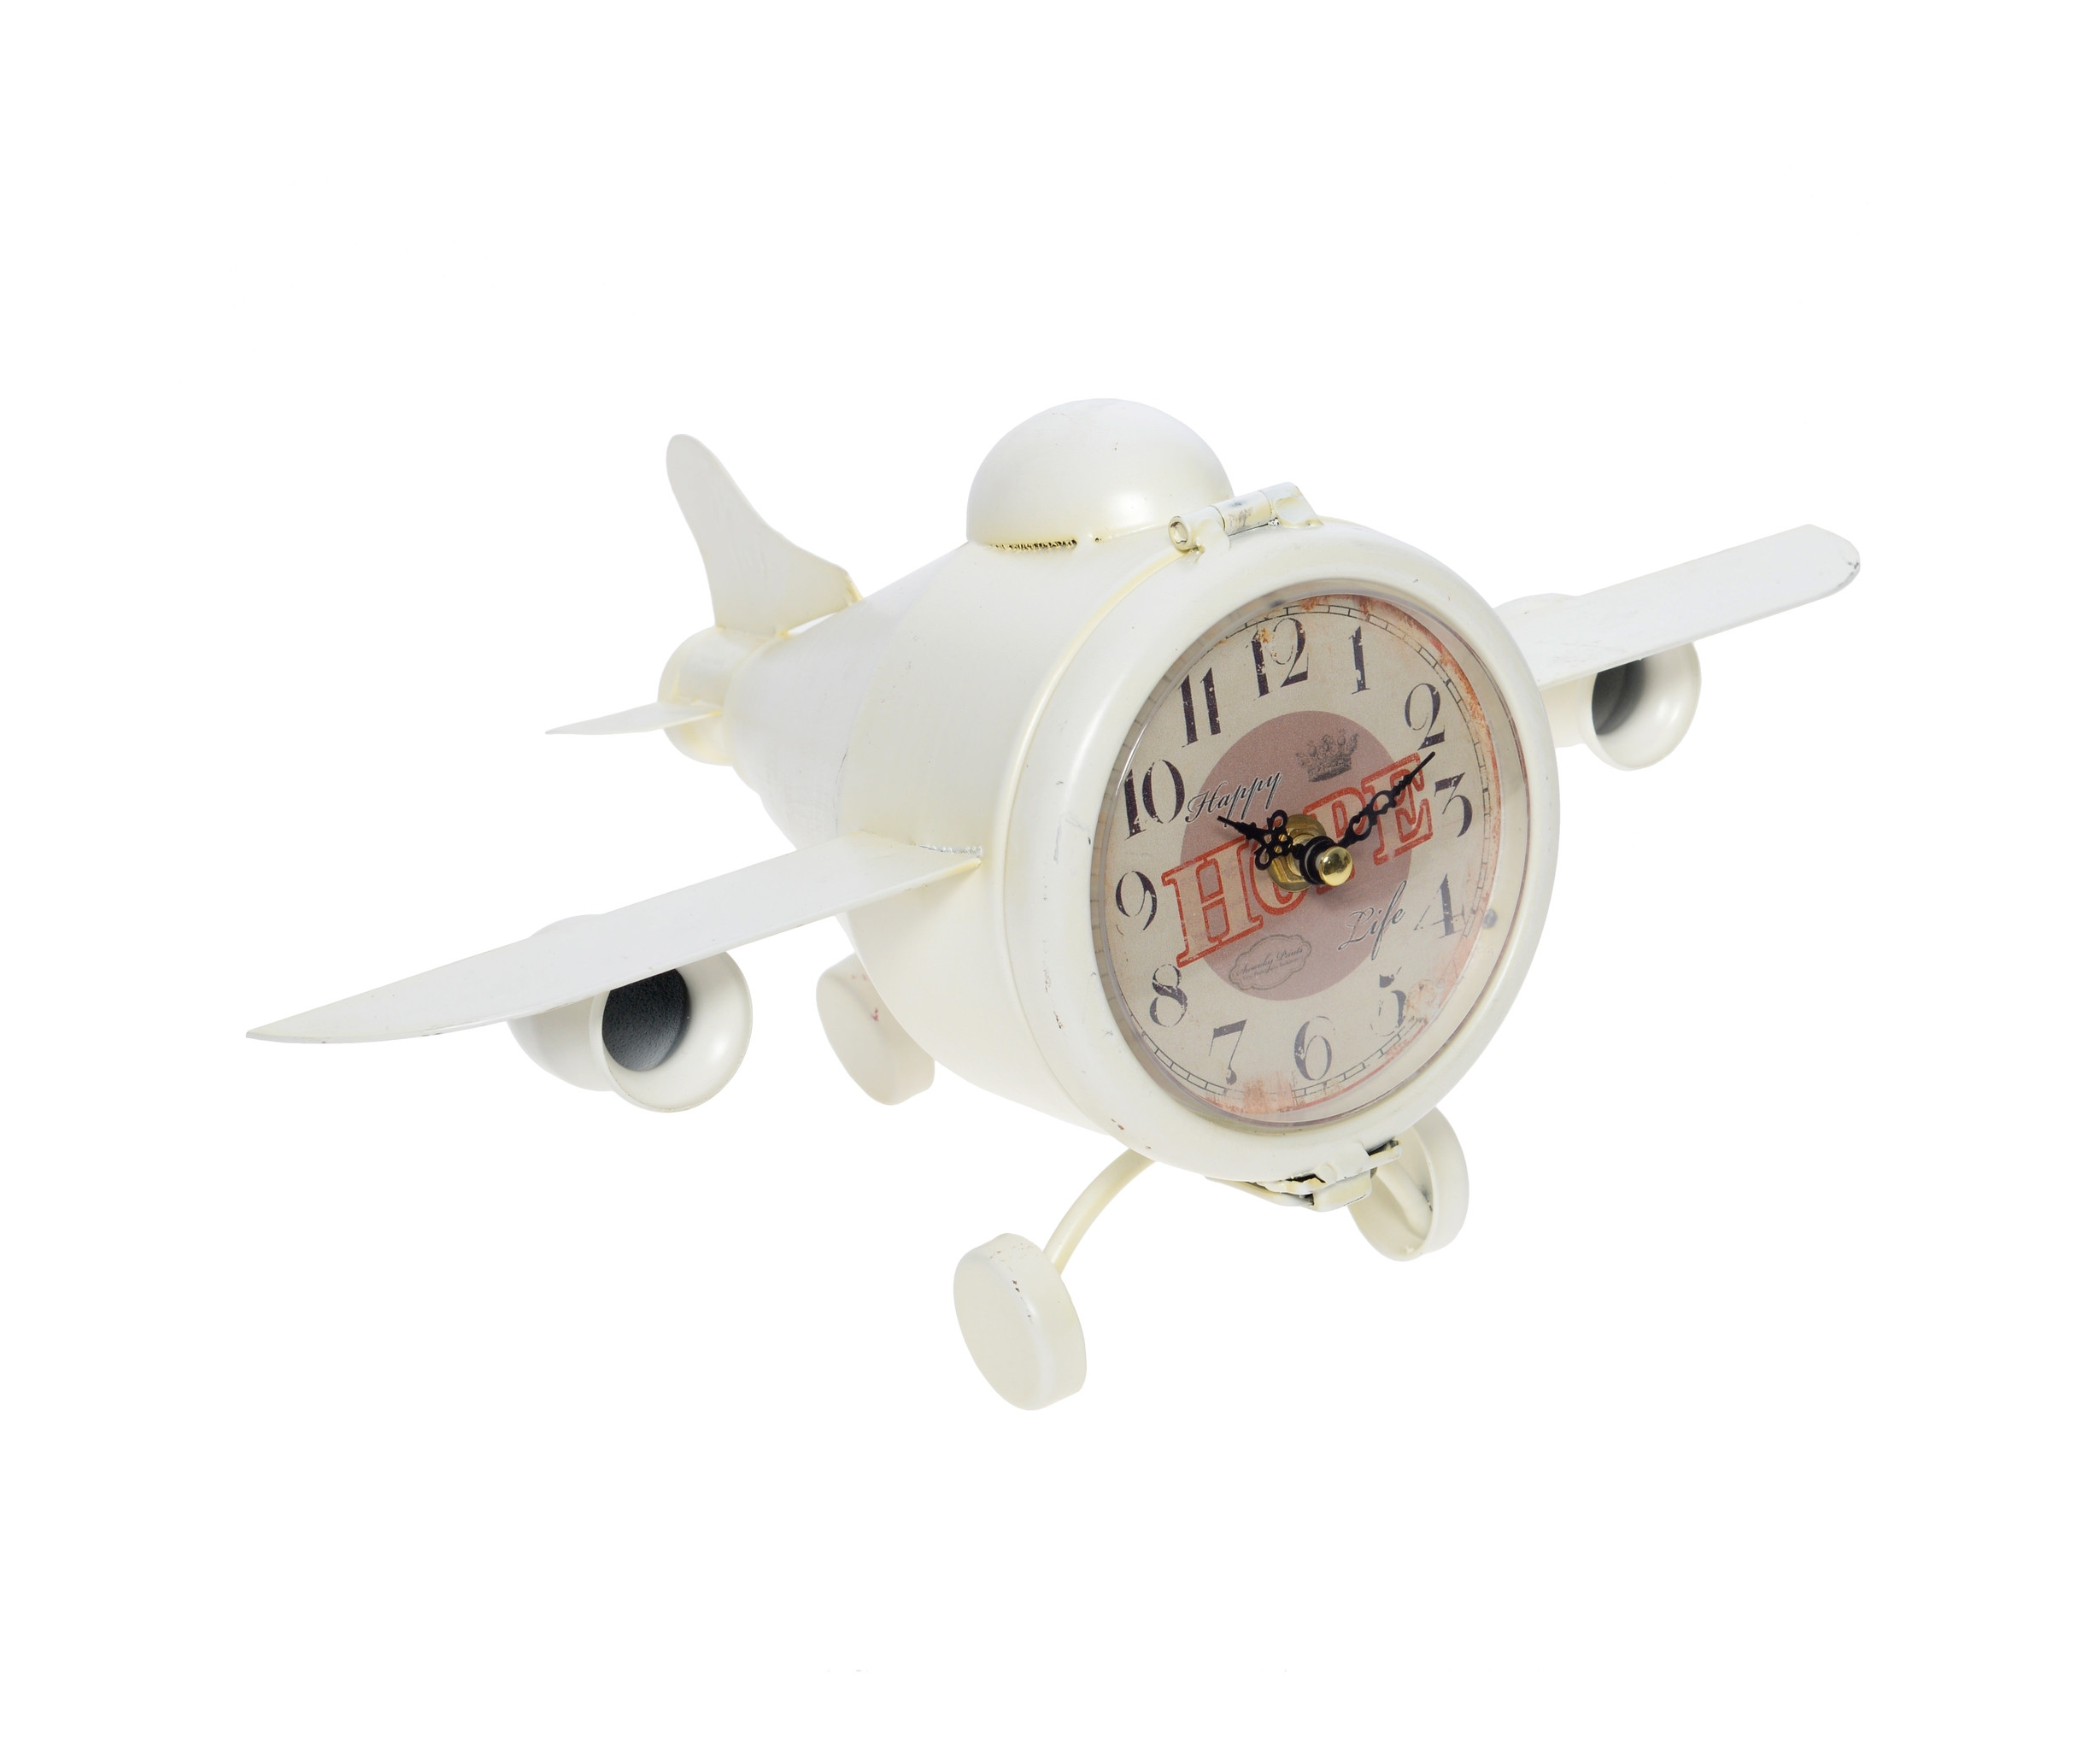 Часы настольные High PeakНастольные часы<br>&amp;lt;span style=&amp;quot;line-height: 24.9999px;&amp;quot;&amp;gt;Кварцевый механизм.&amp;lt;/span&amp;gt;<br><br>Material: Металл<br>Ширина см: 37.0<br>Высота см: 19.0<br>Глубина см: 22.0